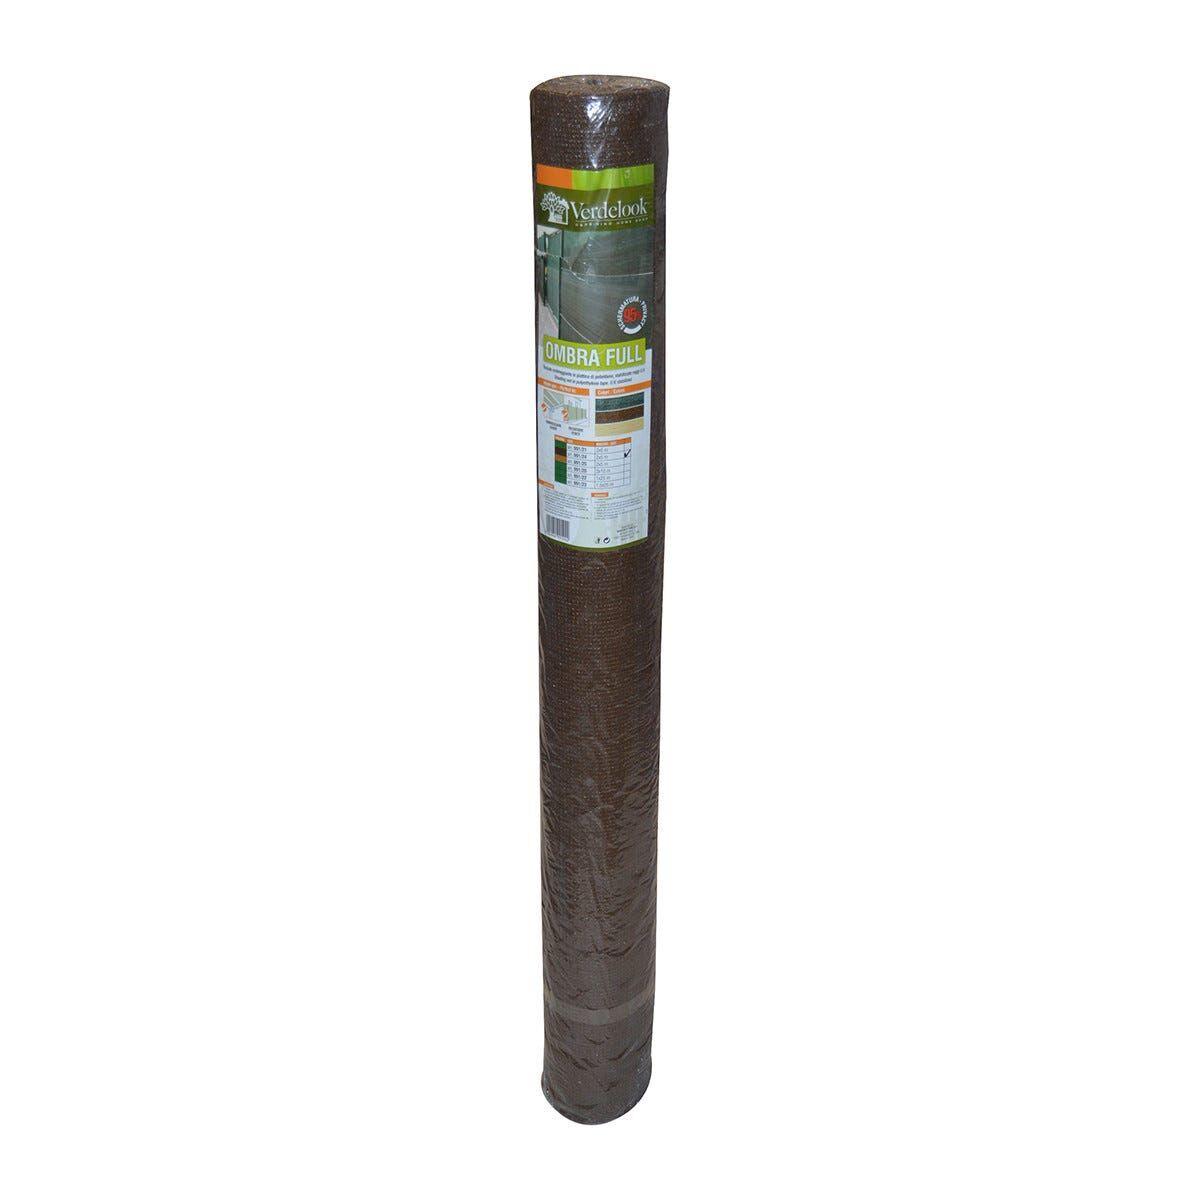 Tessuto Ombra 95% Marrone 200x500 Cm